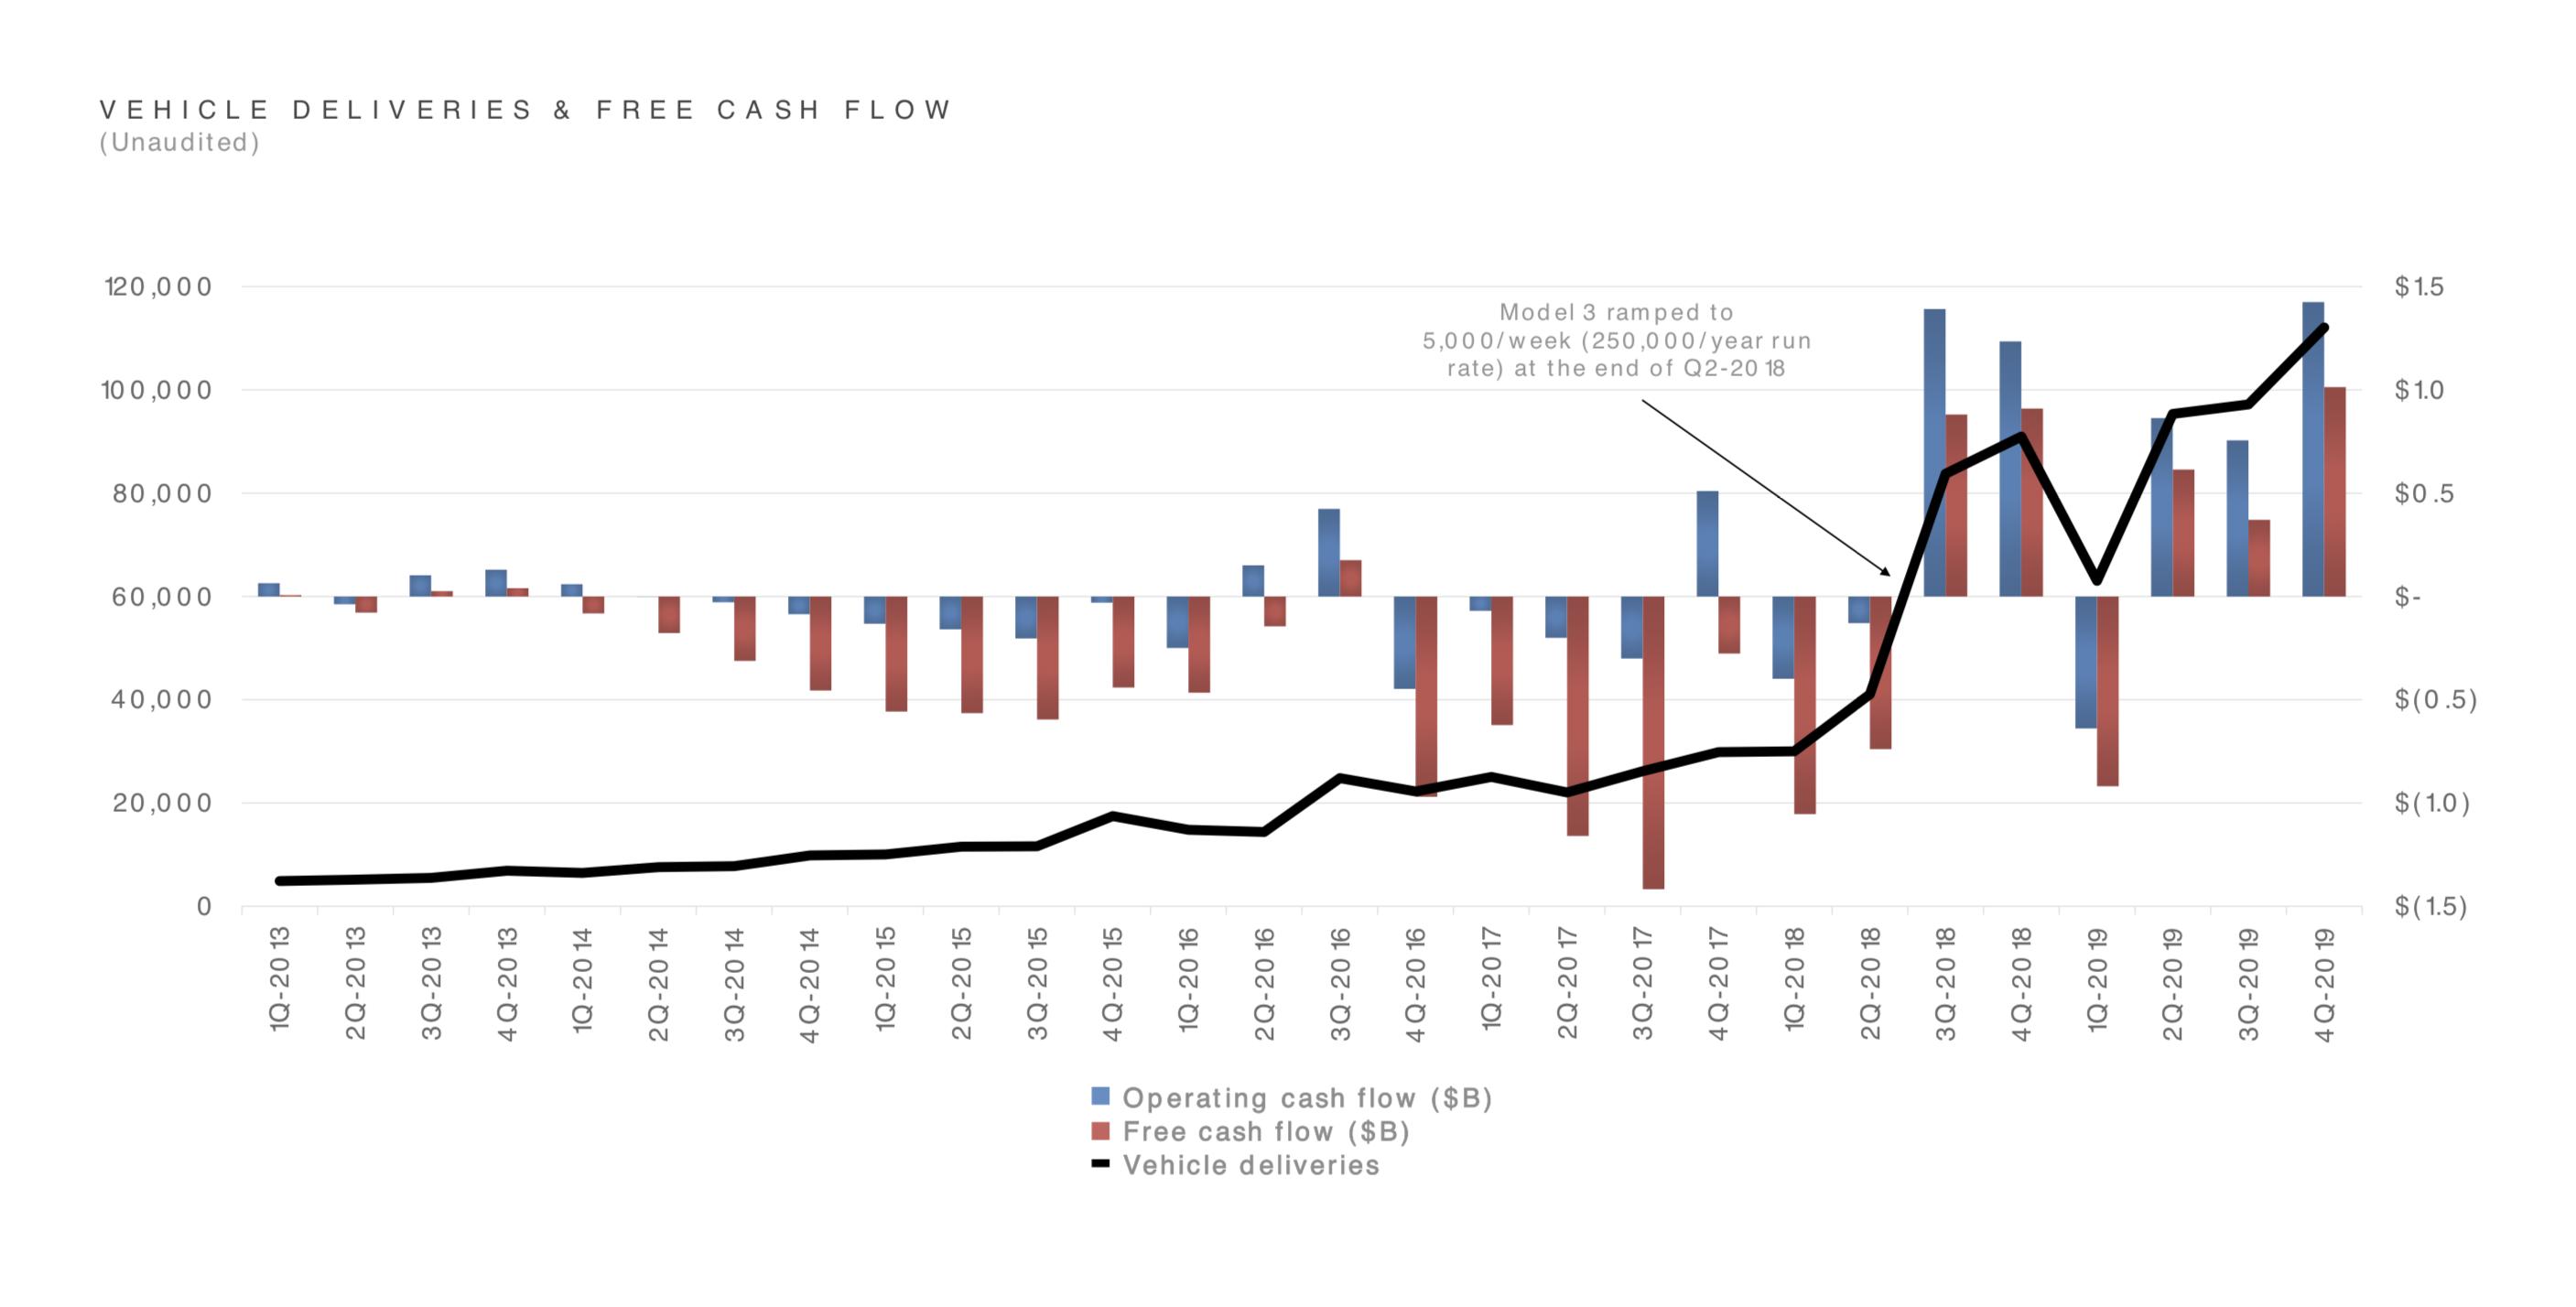 Tesla cash flow vehicle deliveries